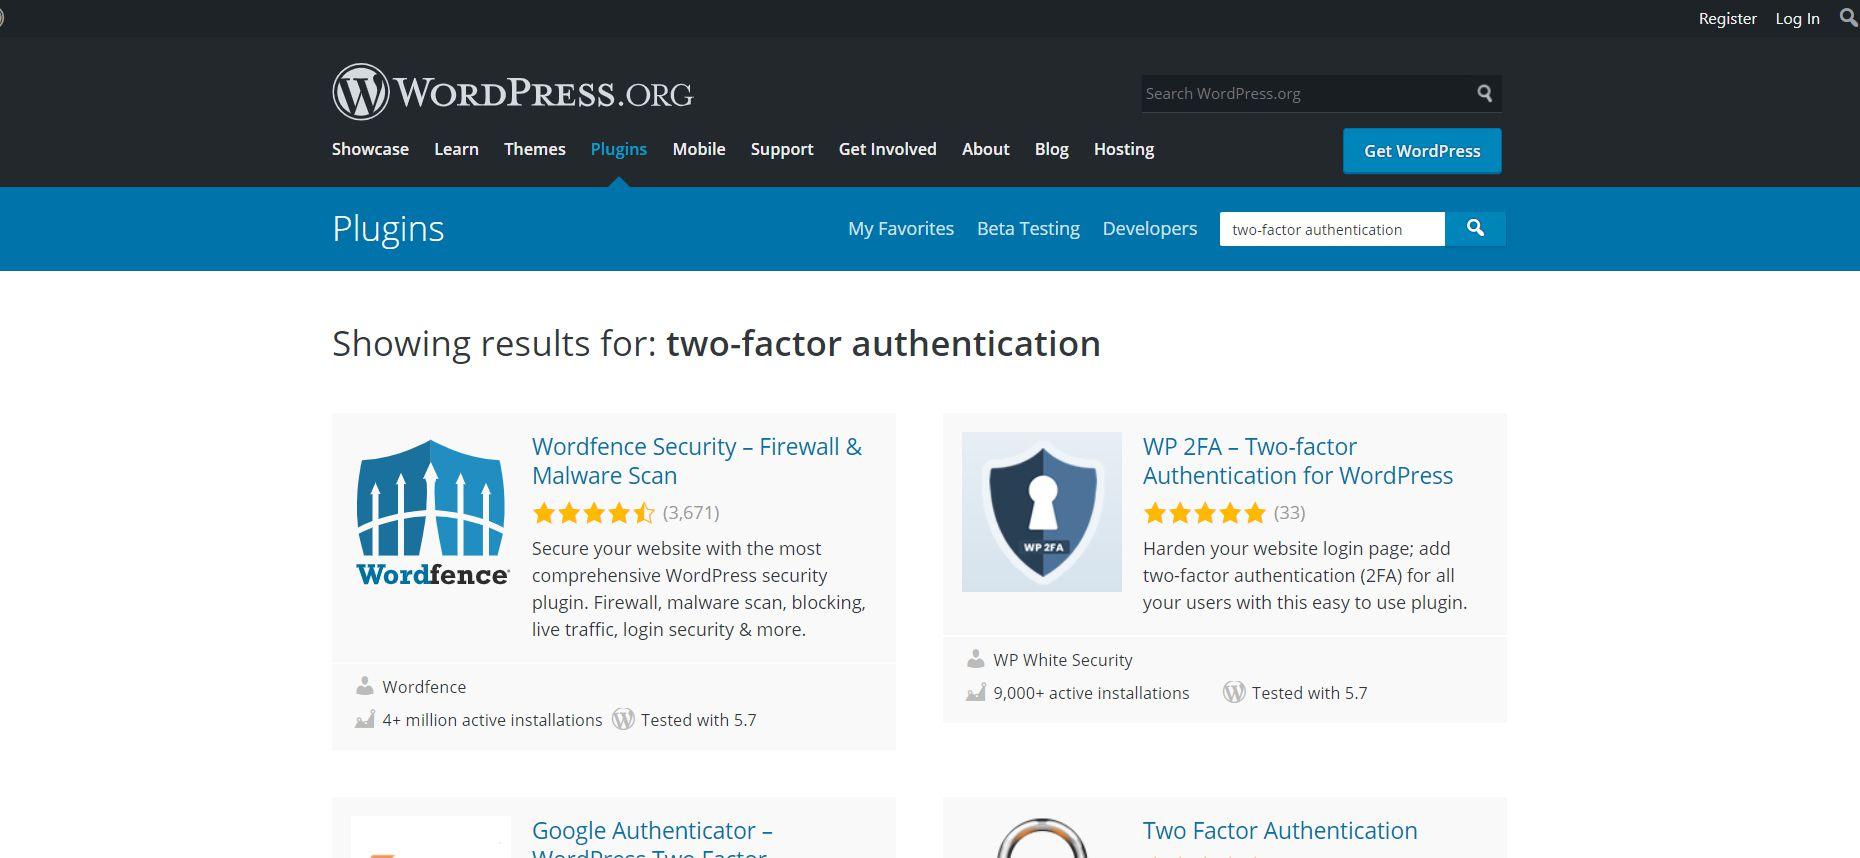 The Wordpress plugins page